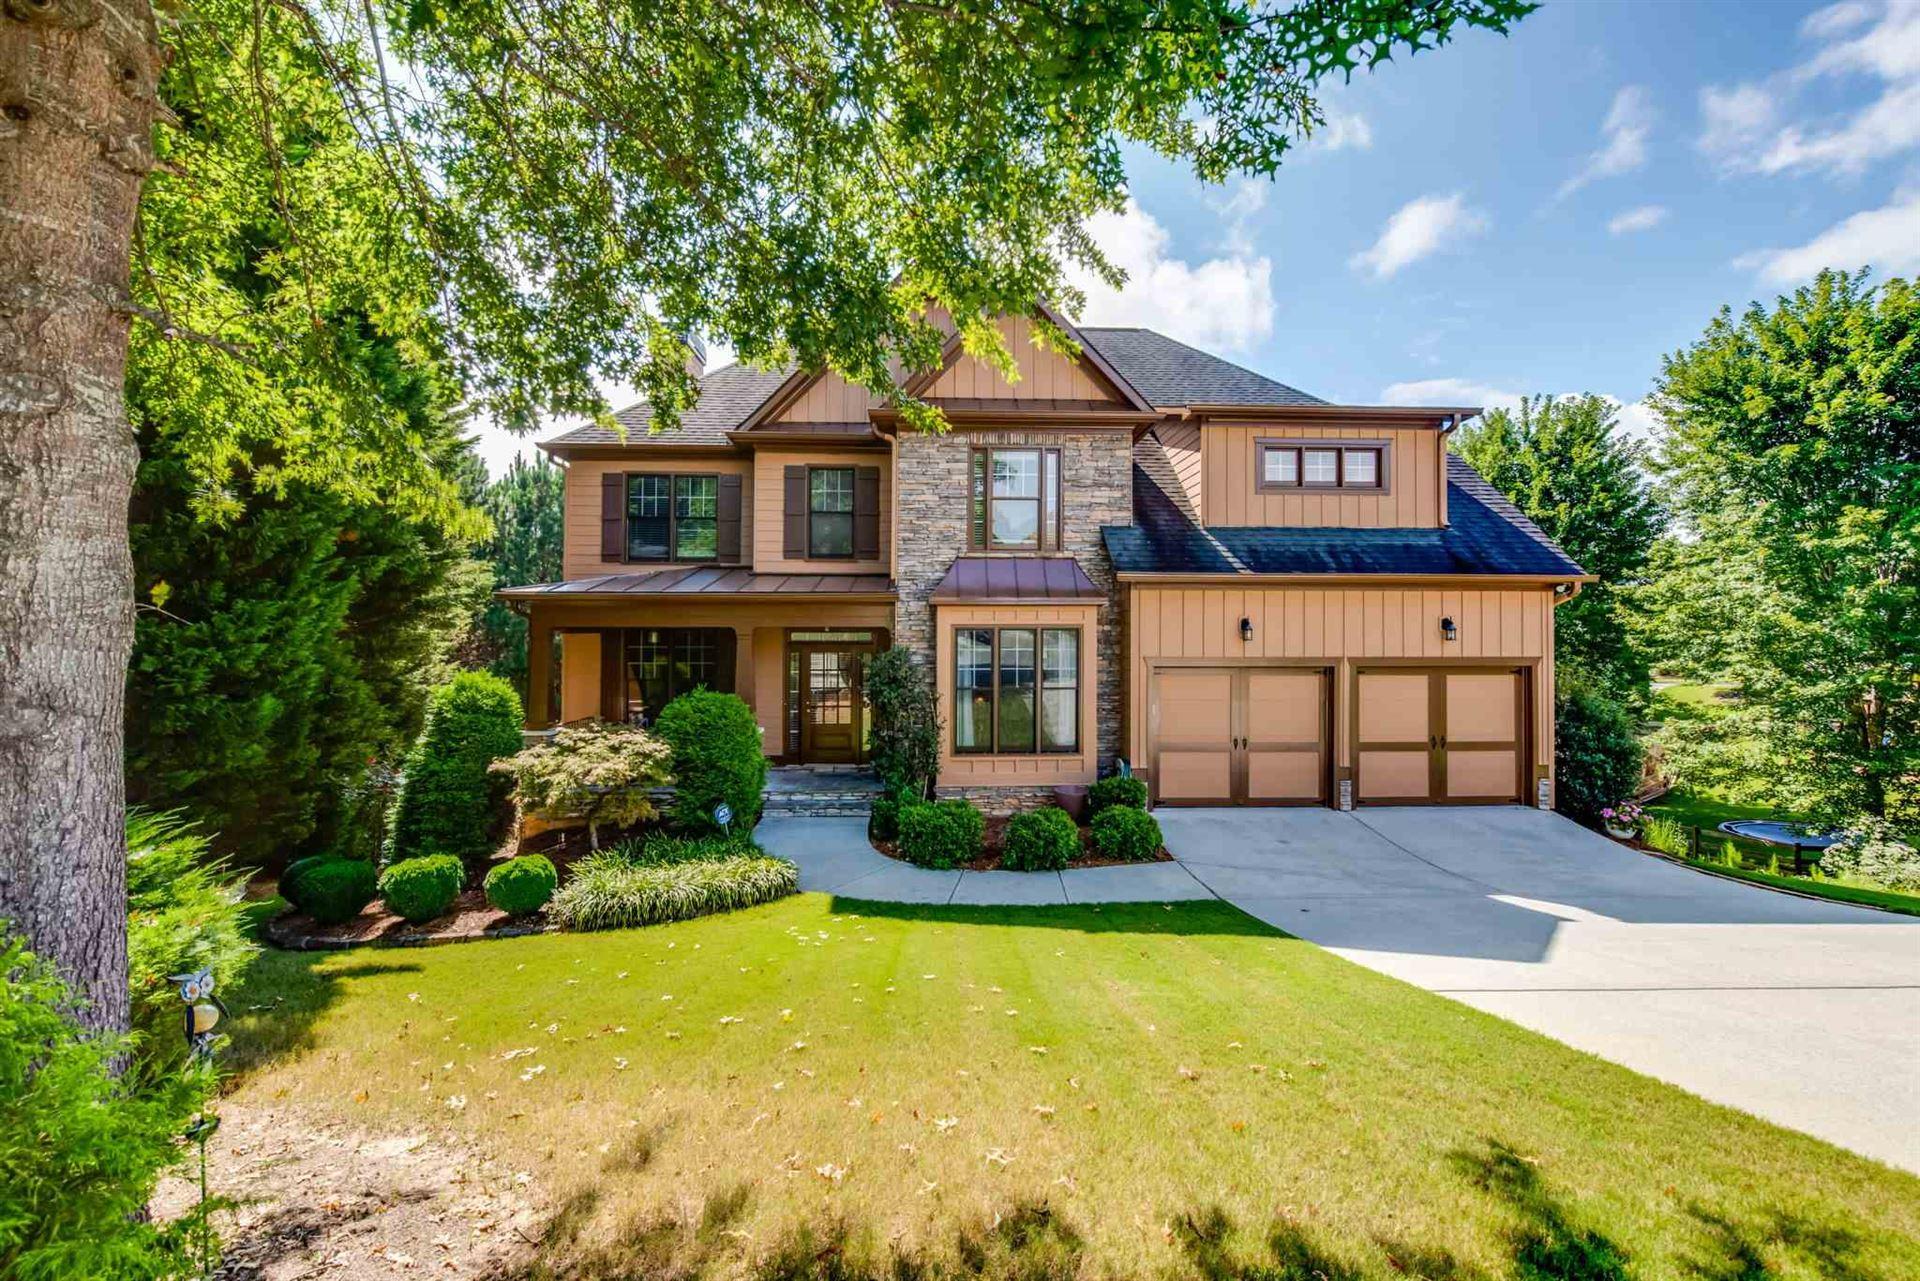 418 Mill Xing, Canton, GA 30114 - MLS#: 8843634